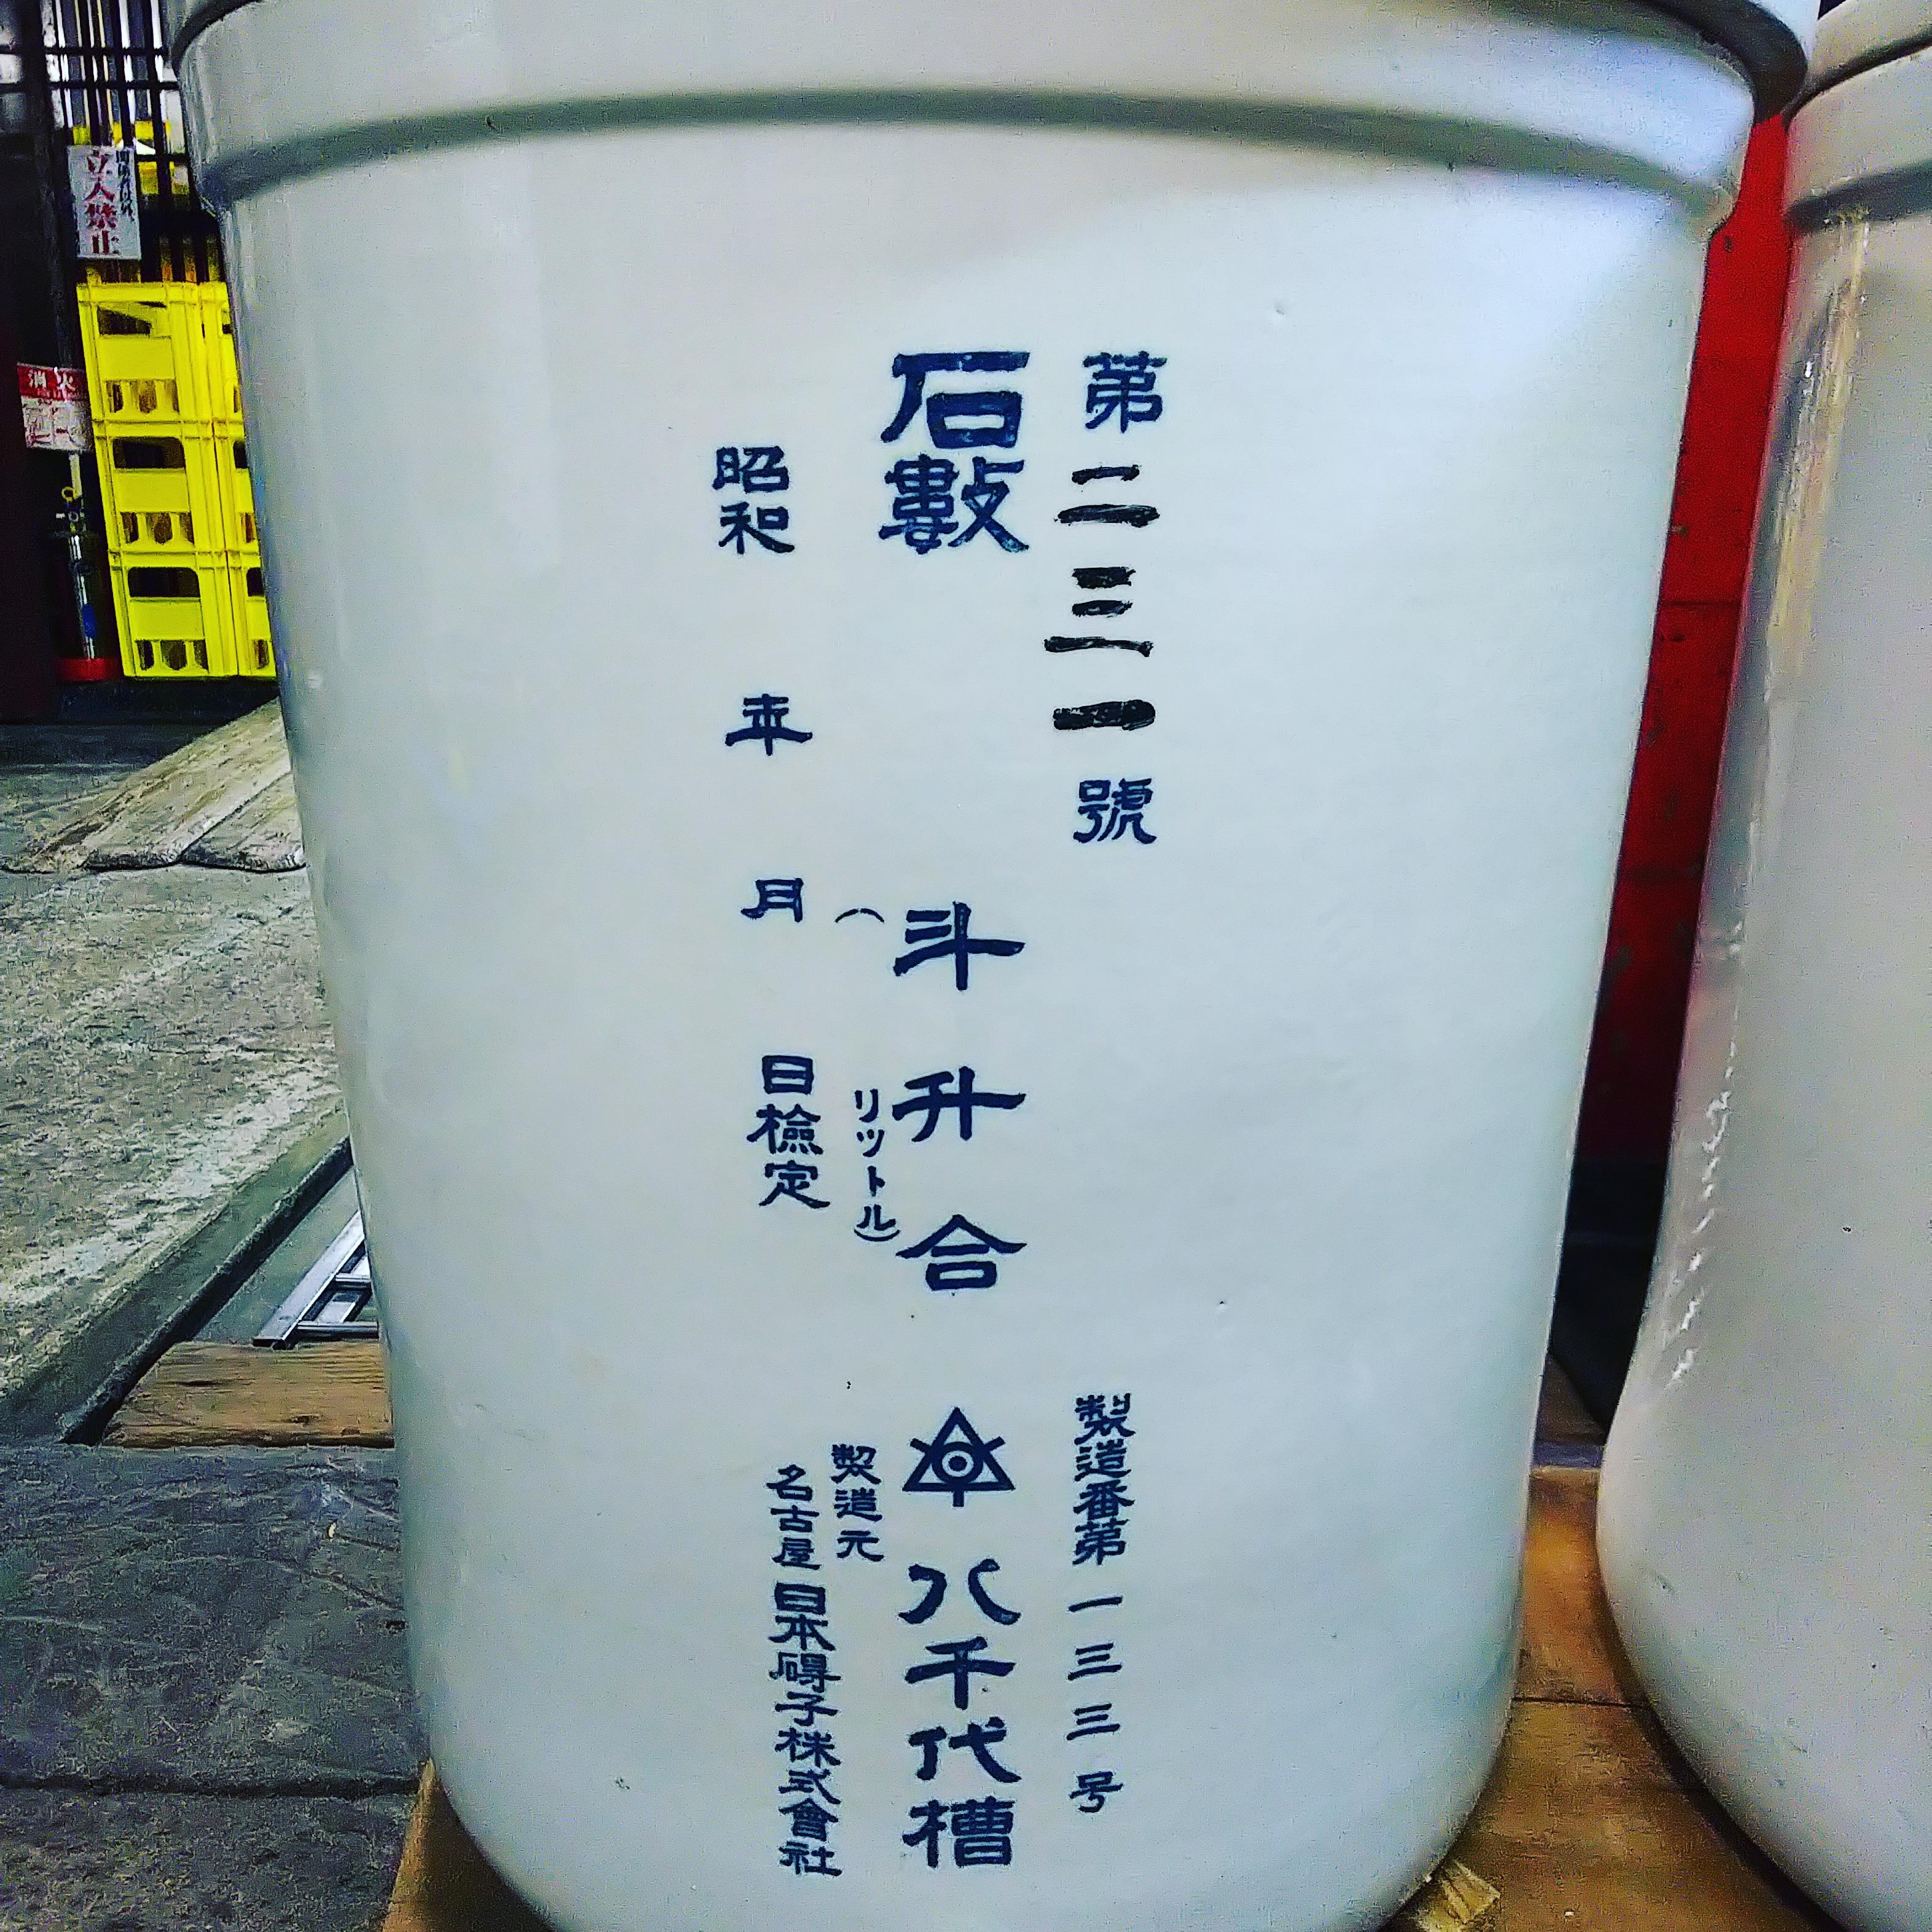 http://www.fukukomachi.com/blog/photo/IMG_20200908_160300_417.jpg